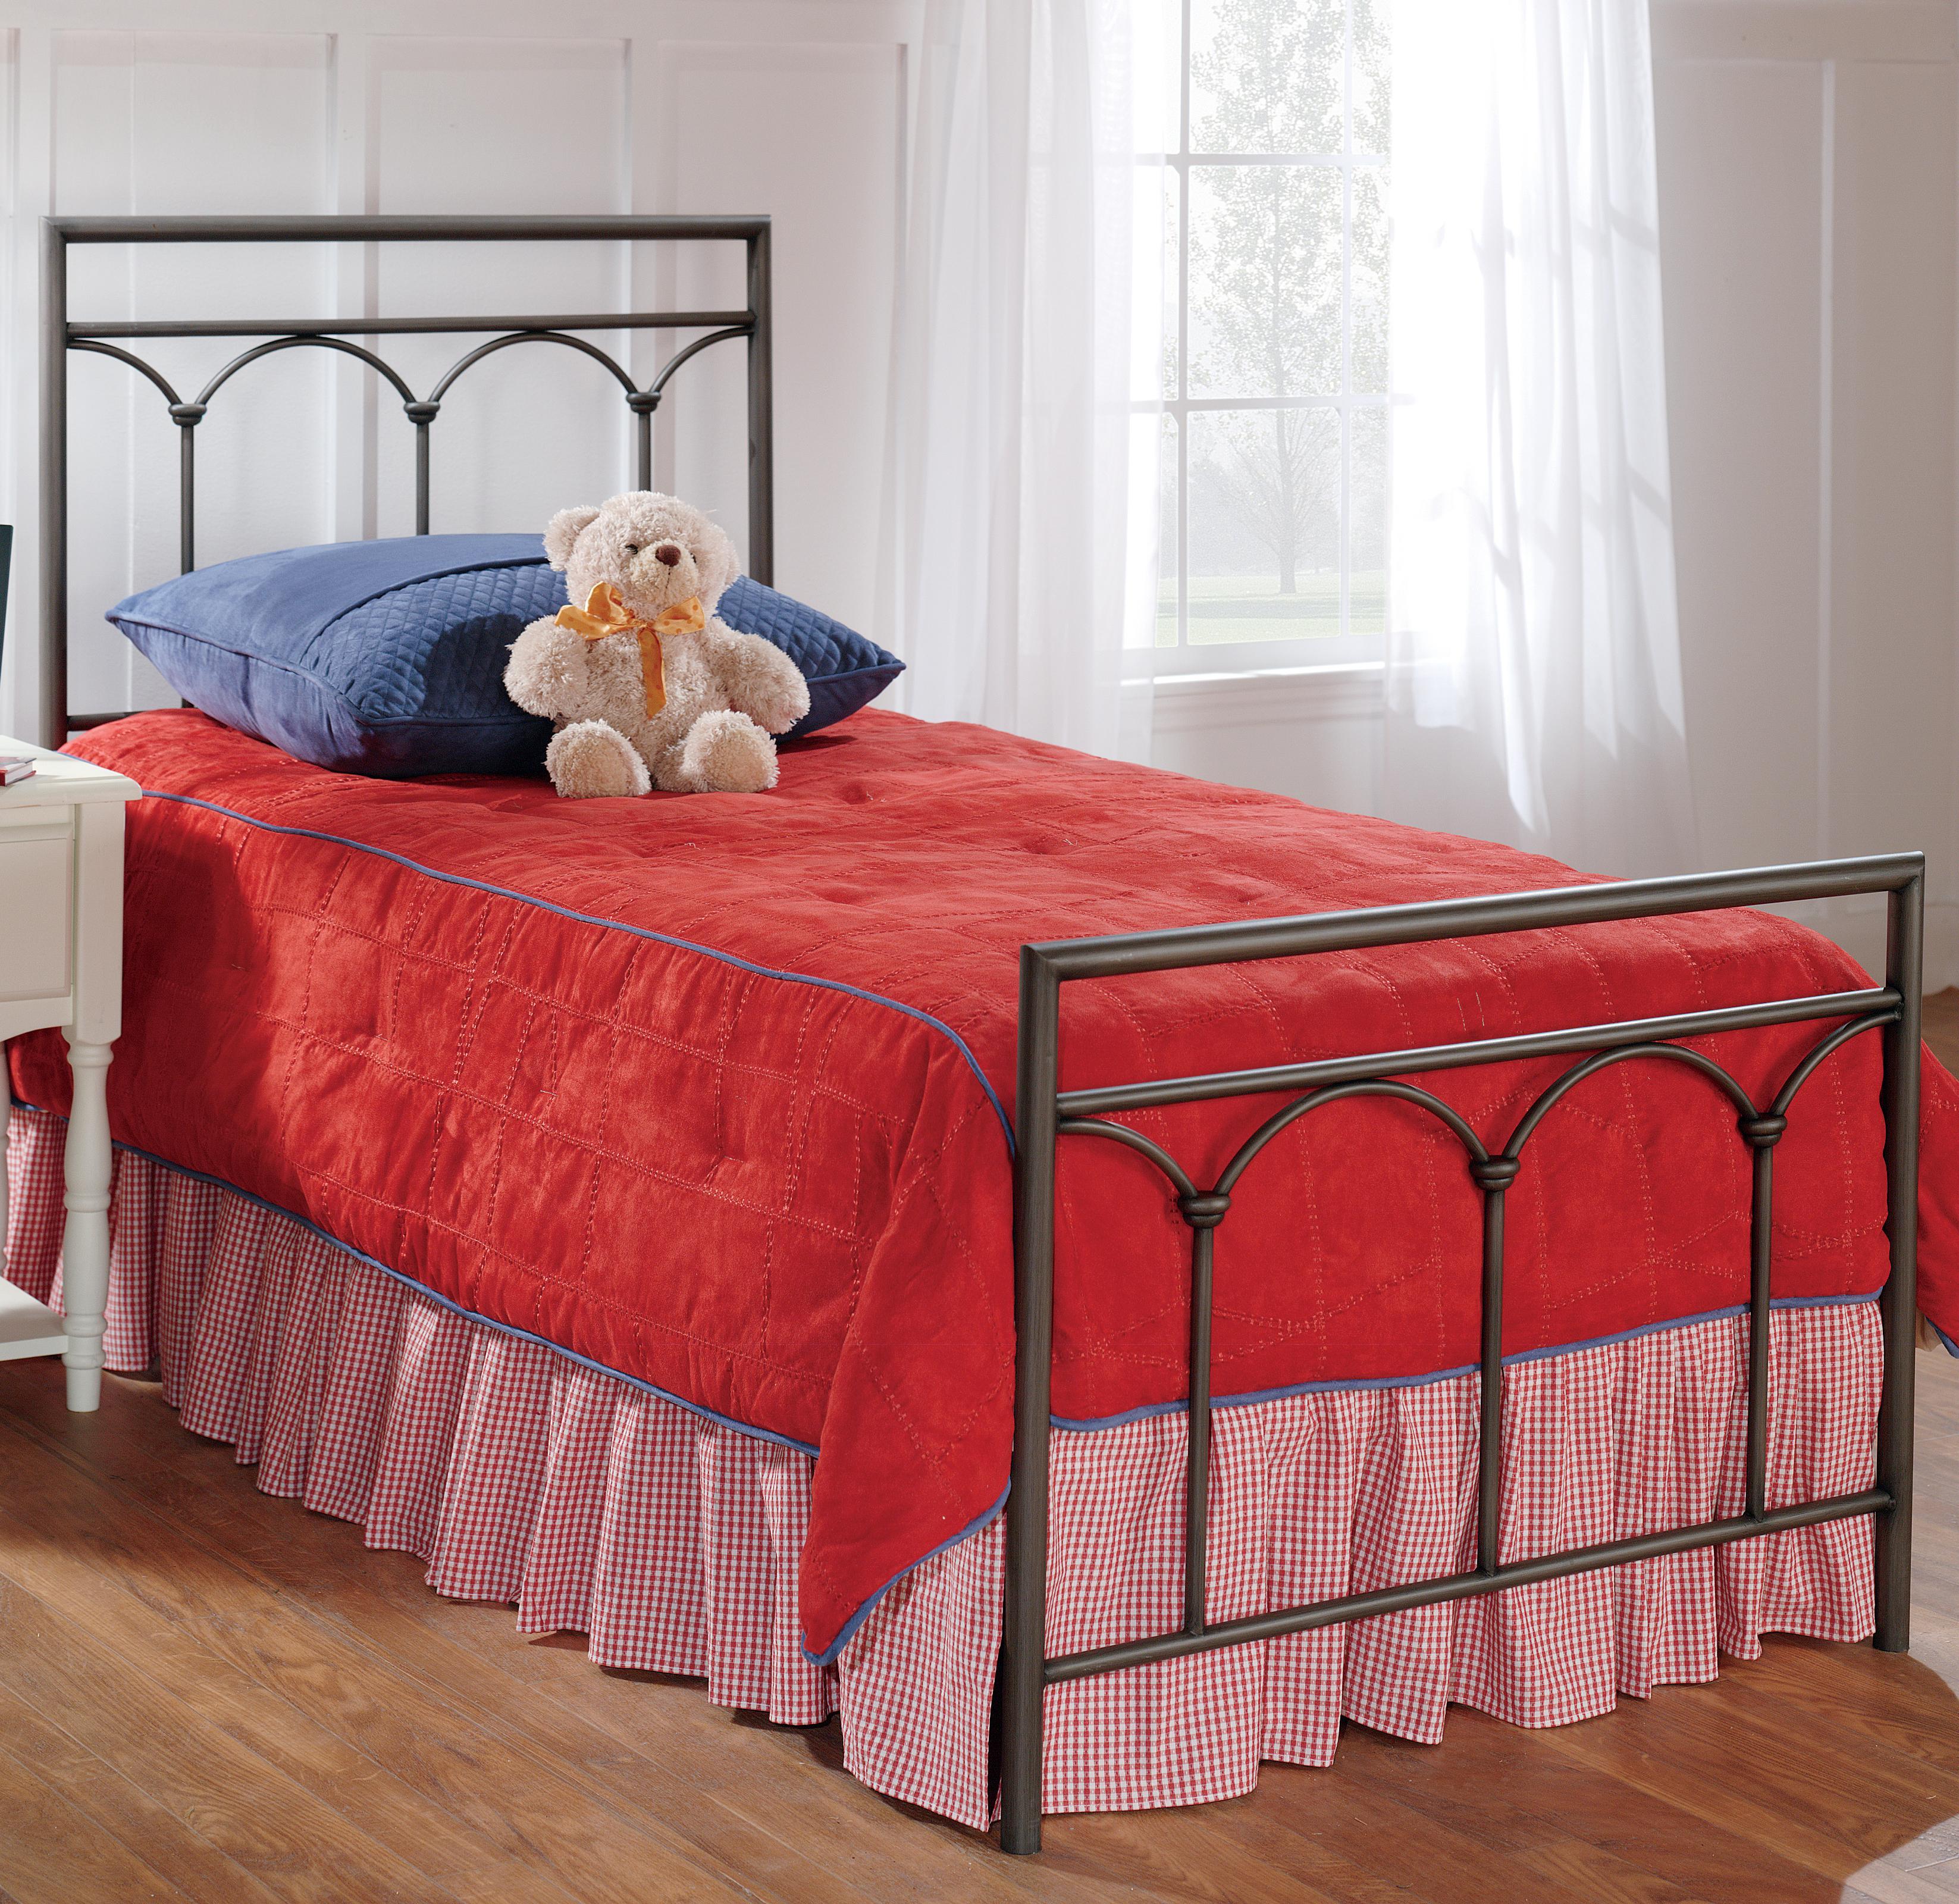 Hillsdale Metal Beds Twin McKenzie Panel Bed - Item Number: 1092BTWR